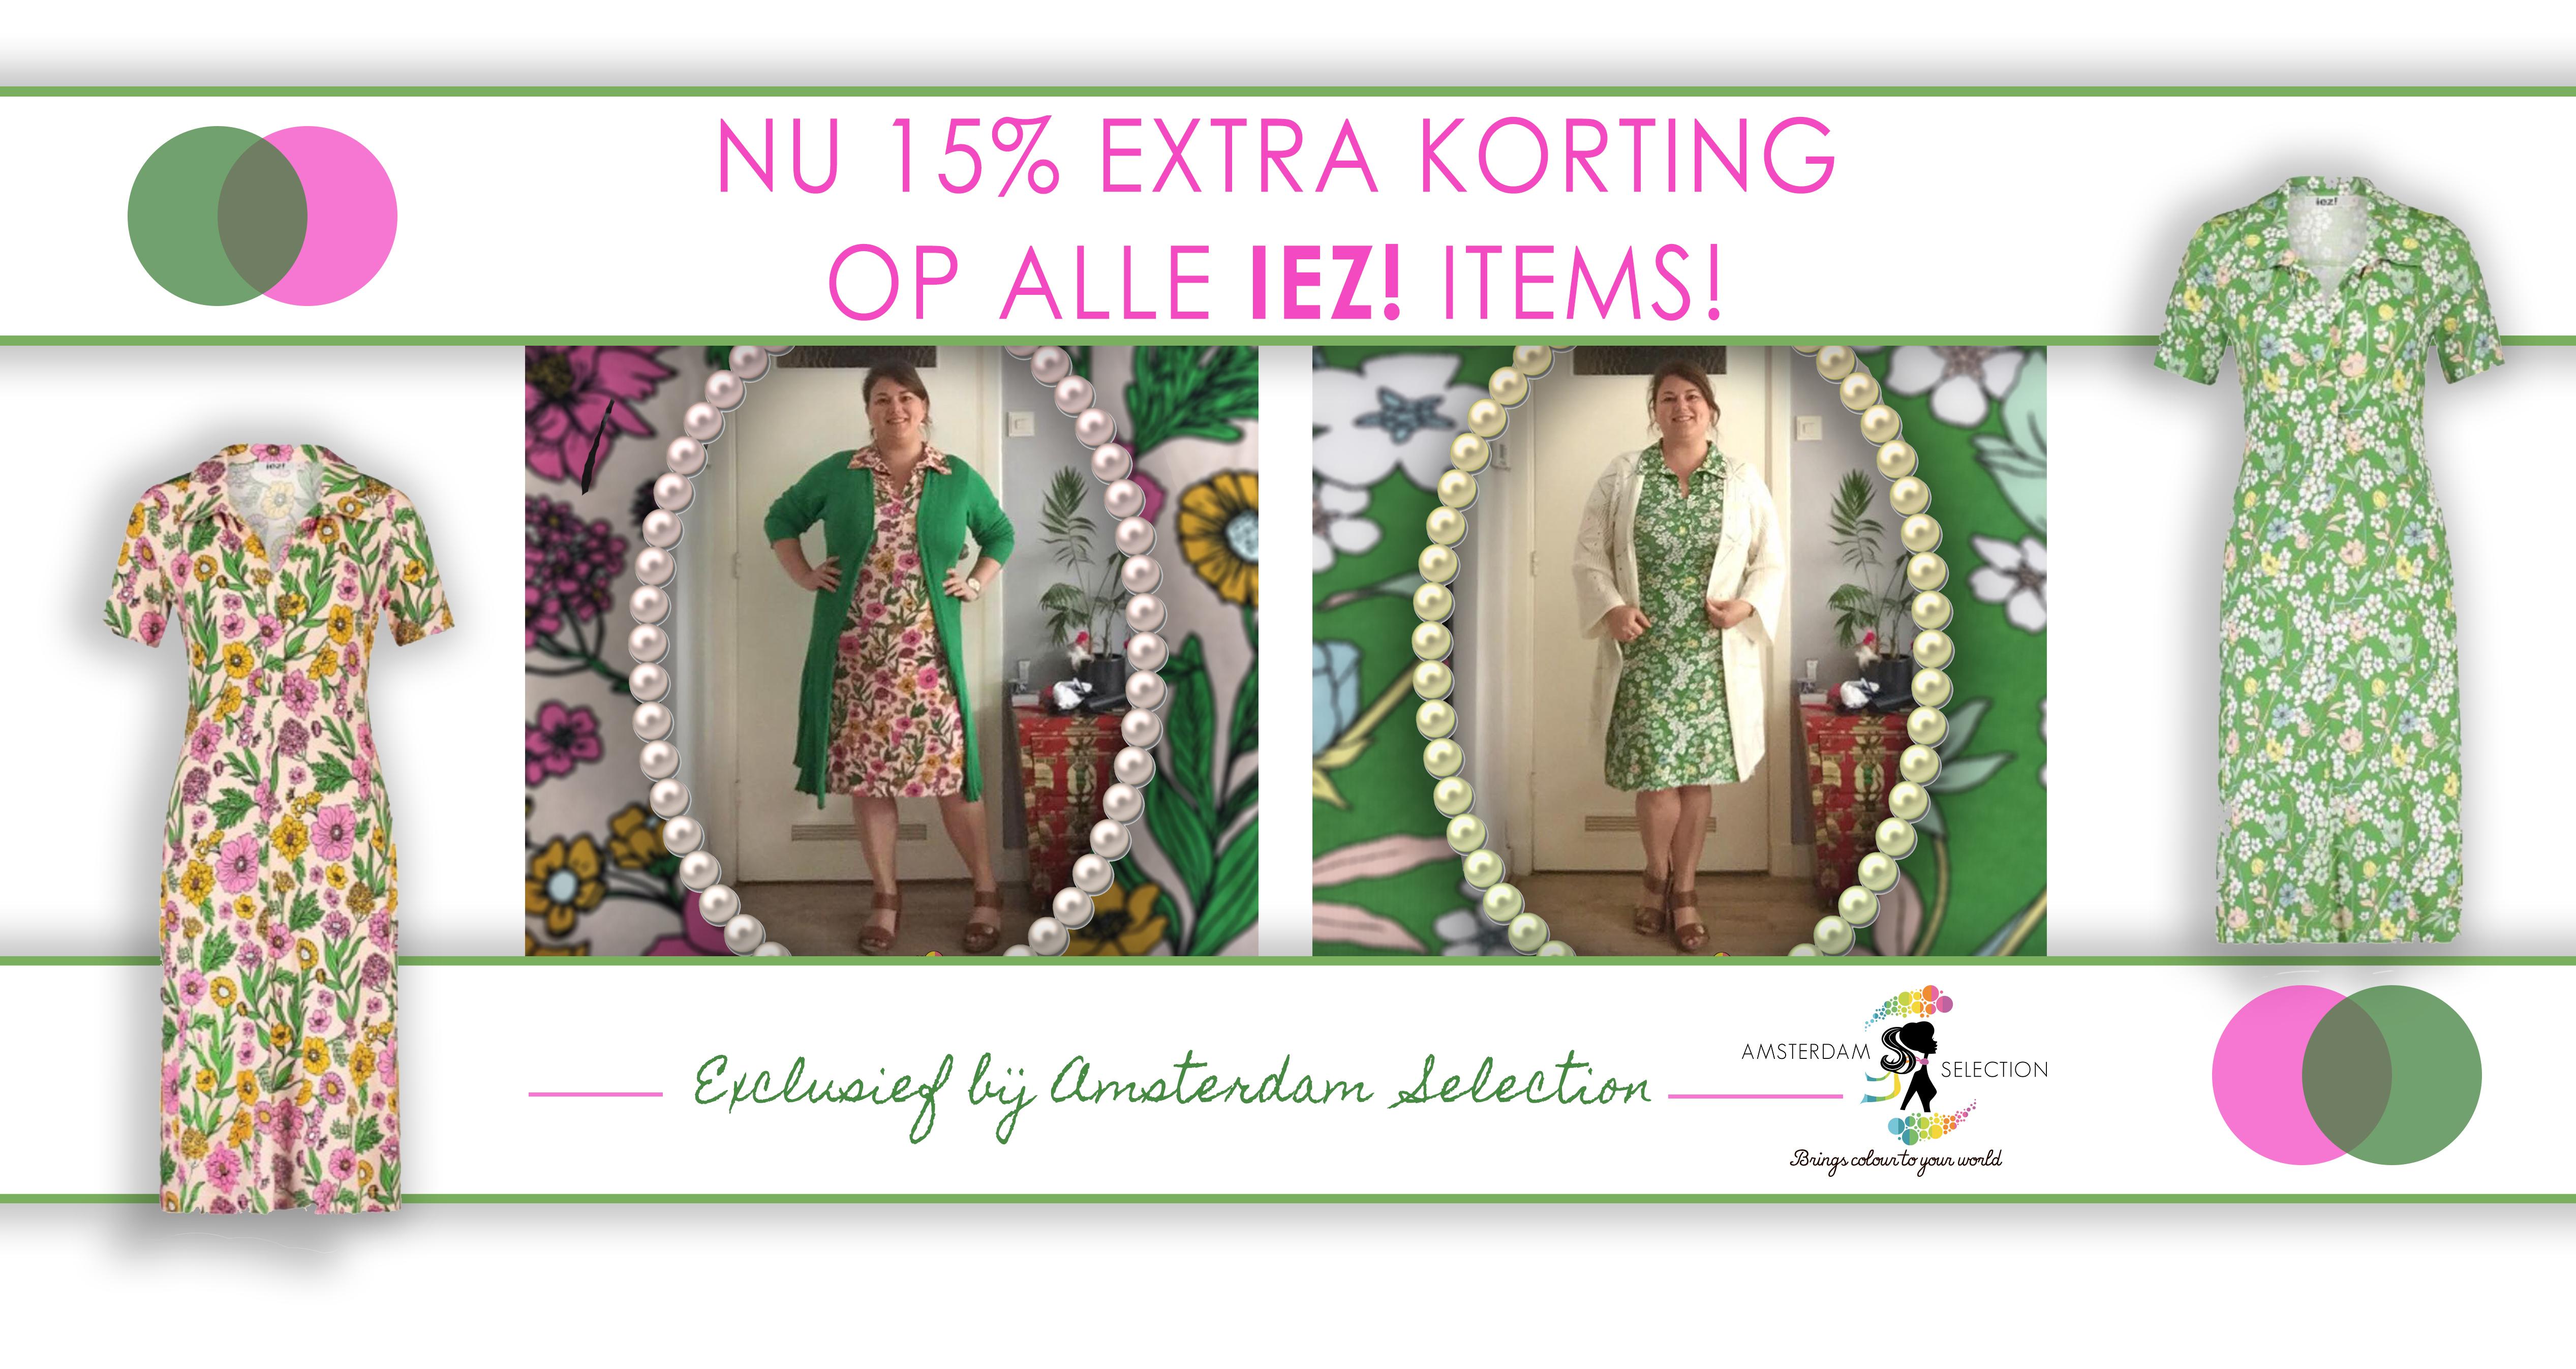 Amsterdam Selection IEZ uitgelicht3